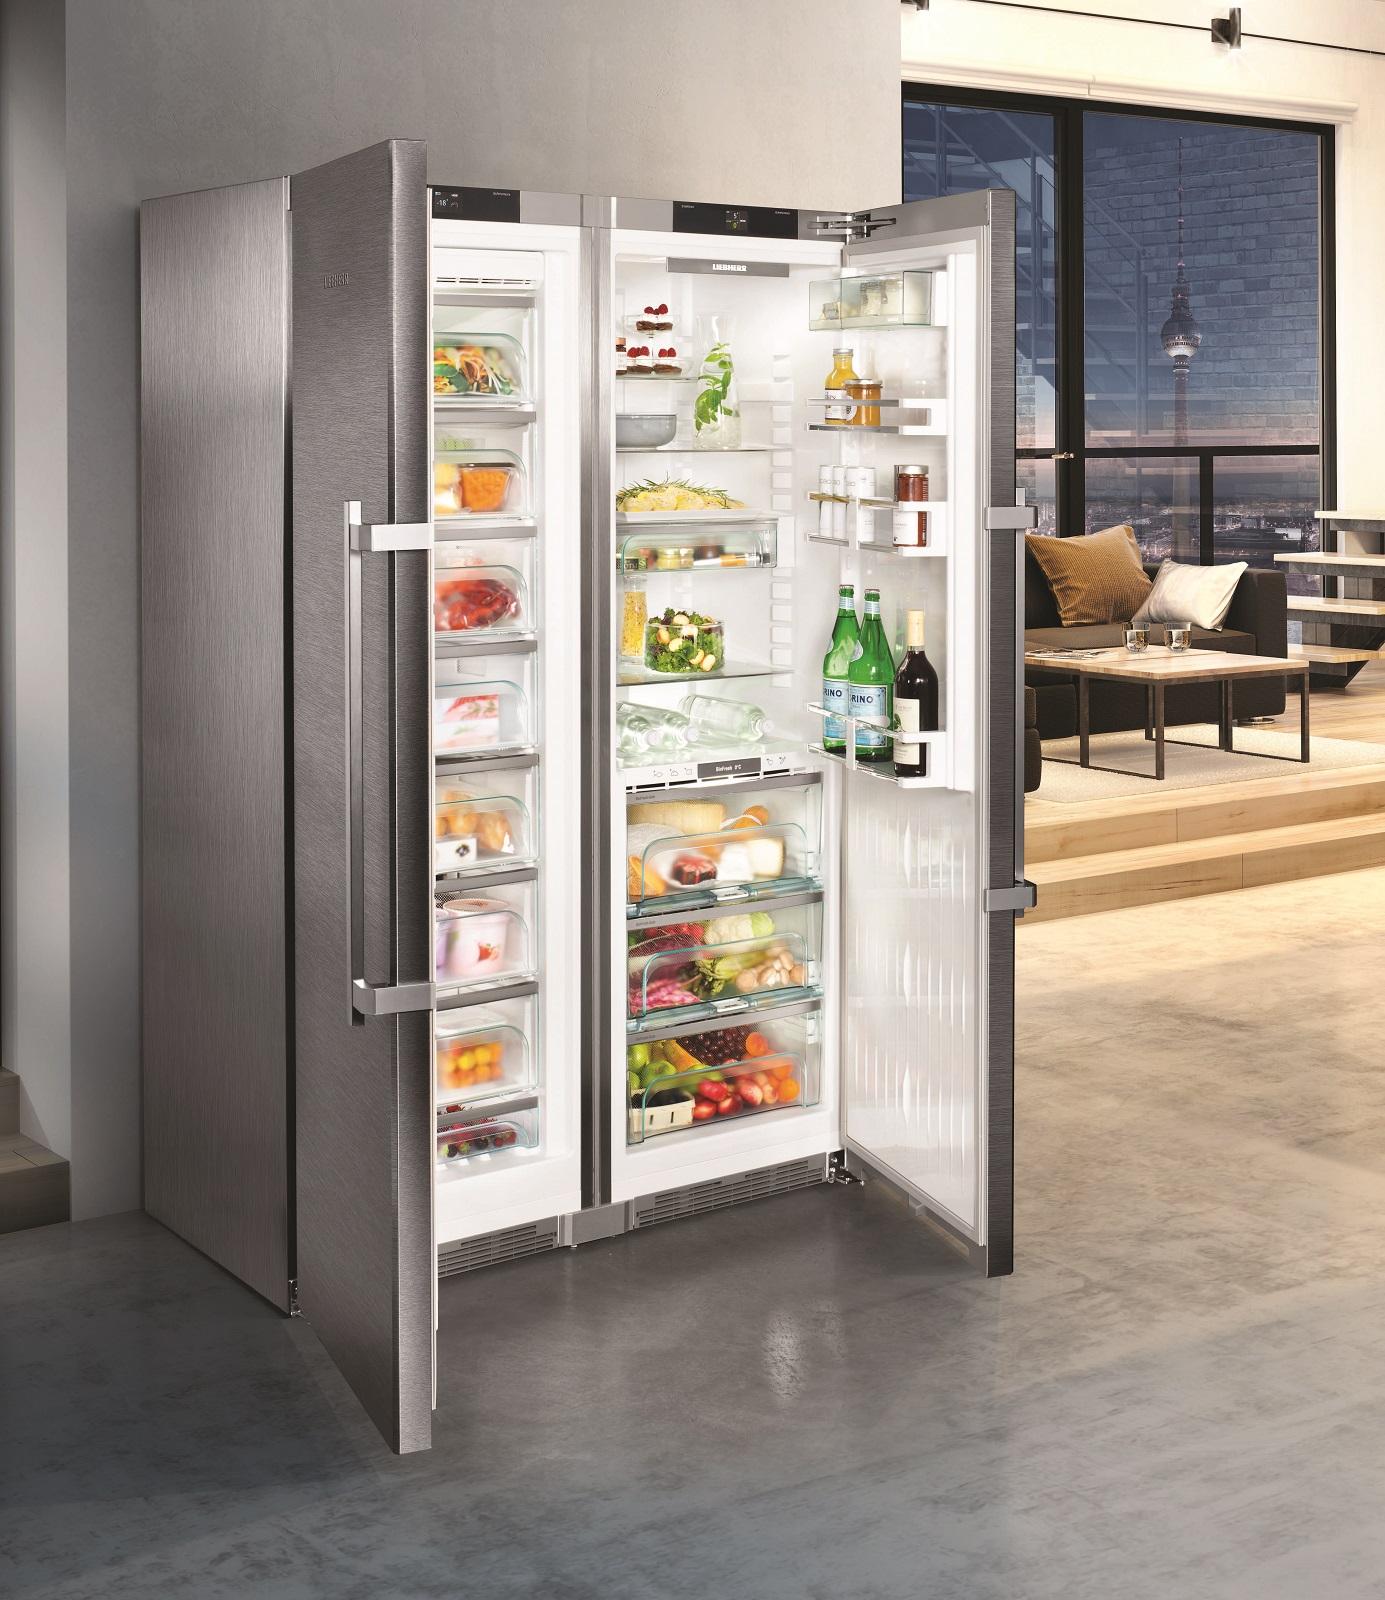 купить Side-by-Side холодильник Liebherr SBSes 8773 Украина фото 4